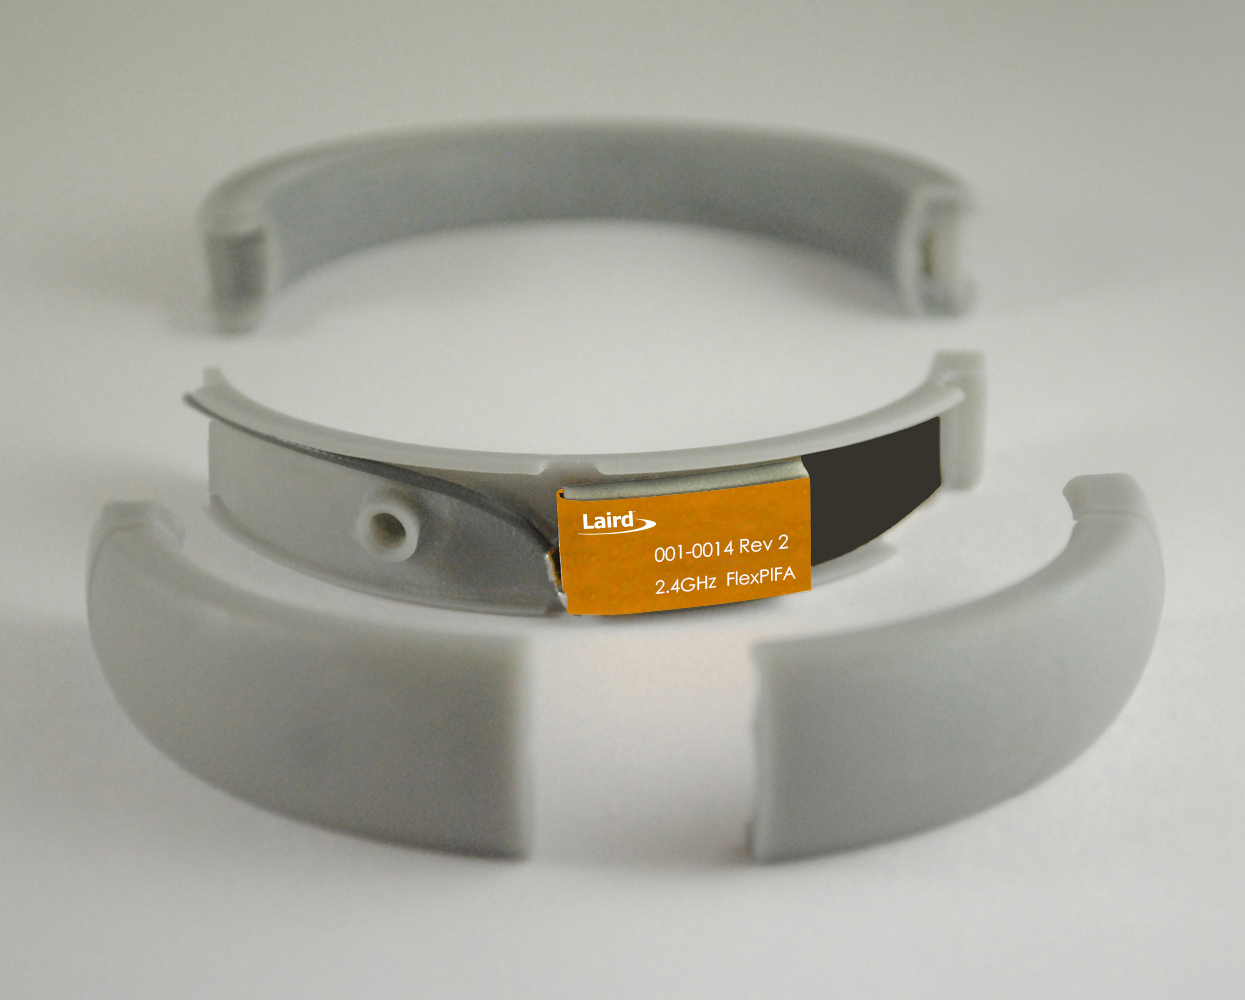 FlexPIFA Flexible Adhesive-Backed PIFA Antennas